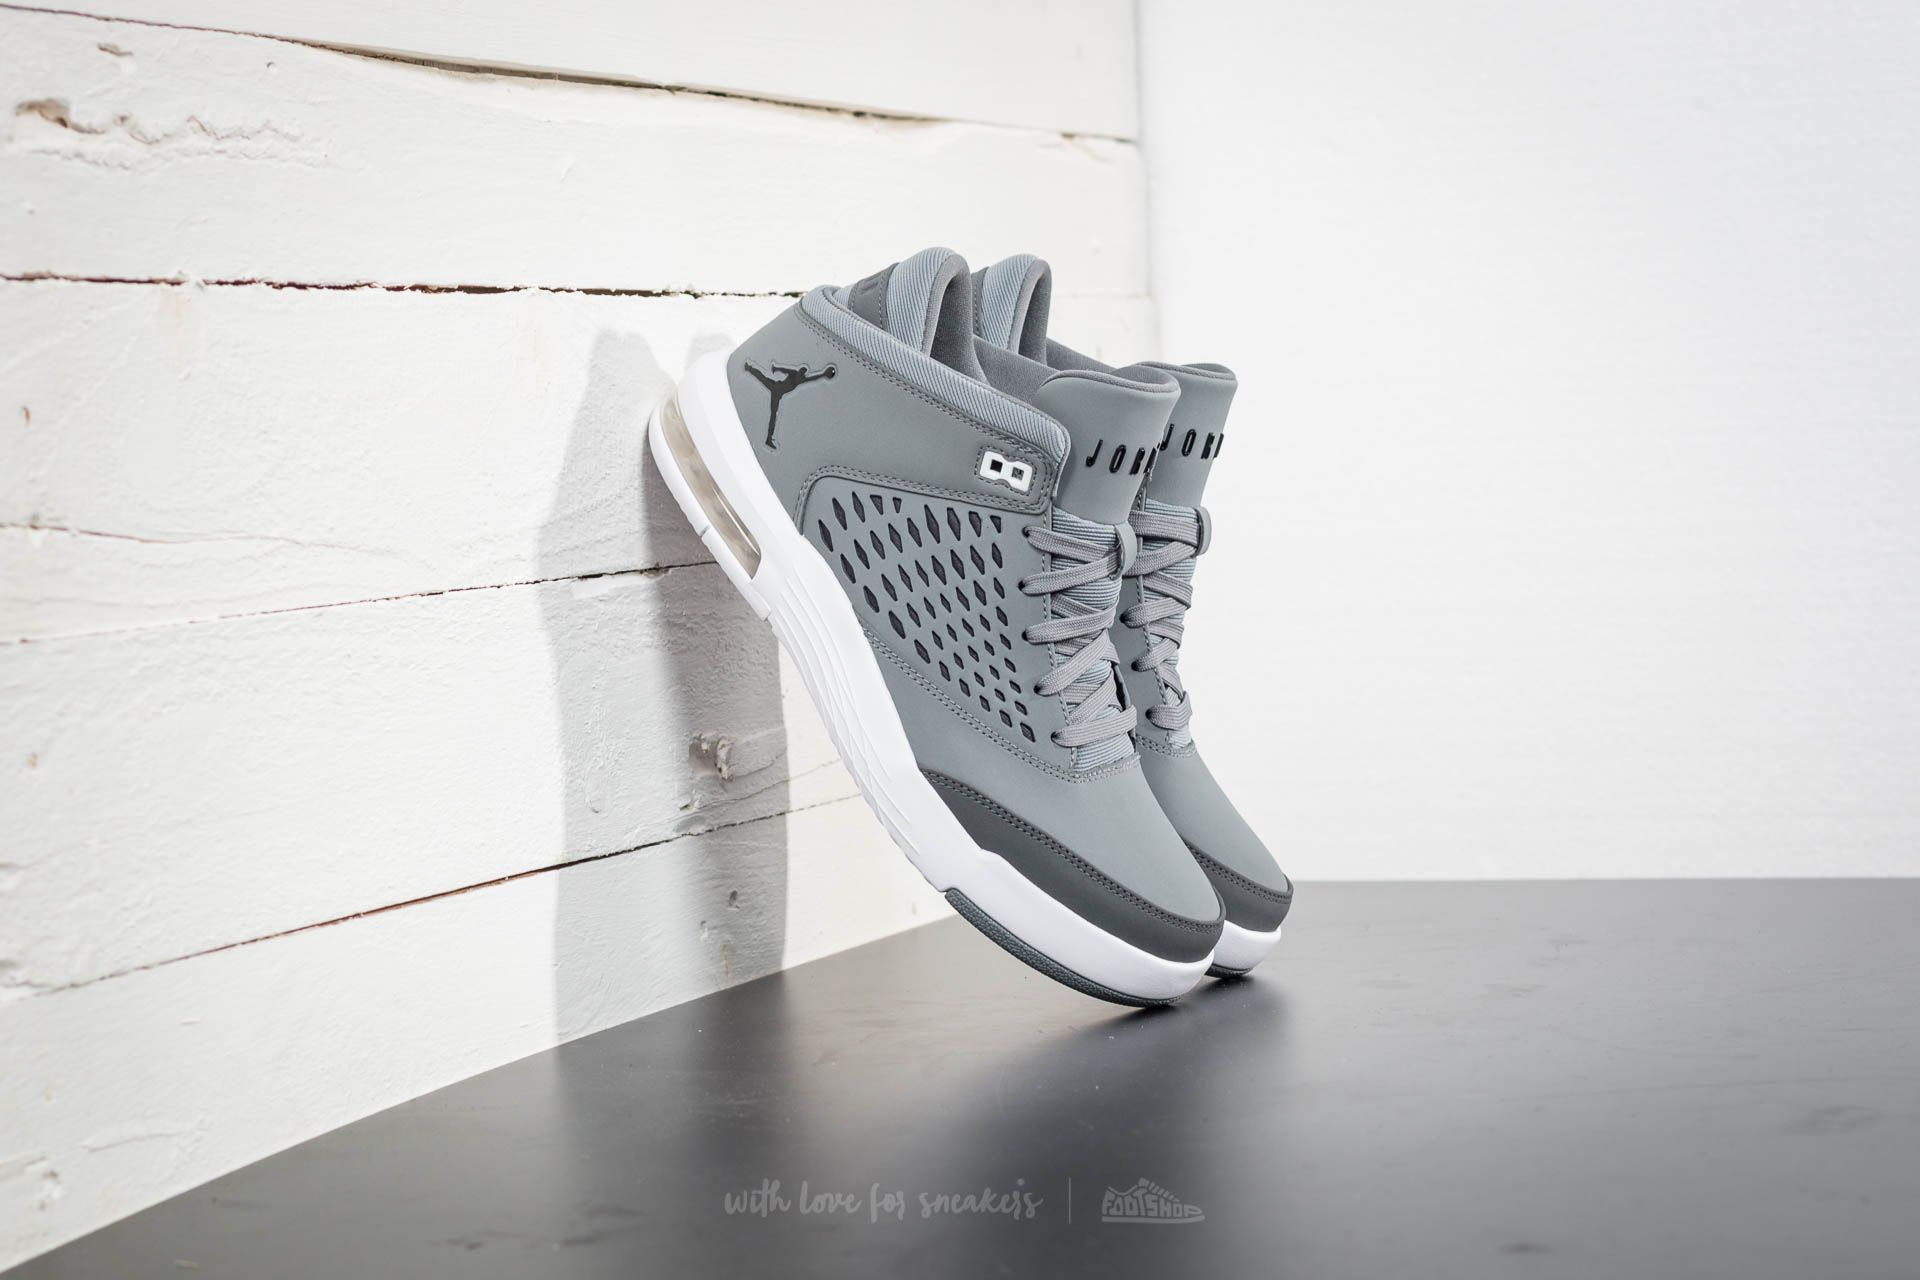 huge discount c94e8 ccd48 Jordan Flight Origin 4 Cool Grey/ Black-Dark Grey | Footshop